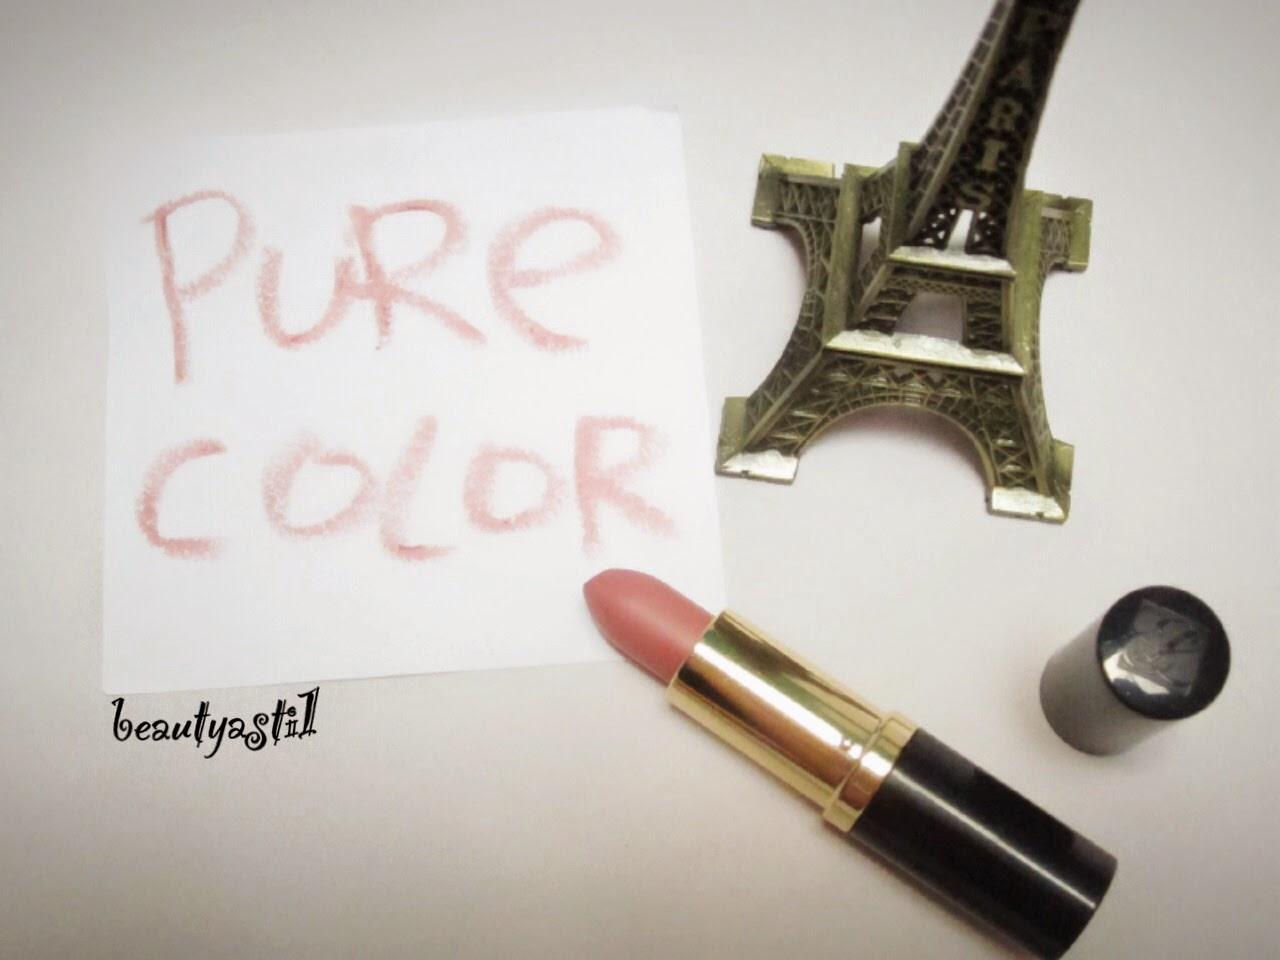 swatch-warna-estee-lauder-pure-color-crystal-baby-creme-lipstick.jpg